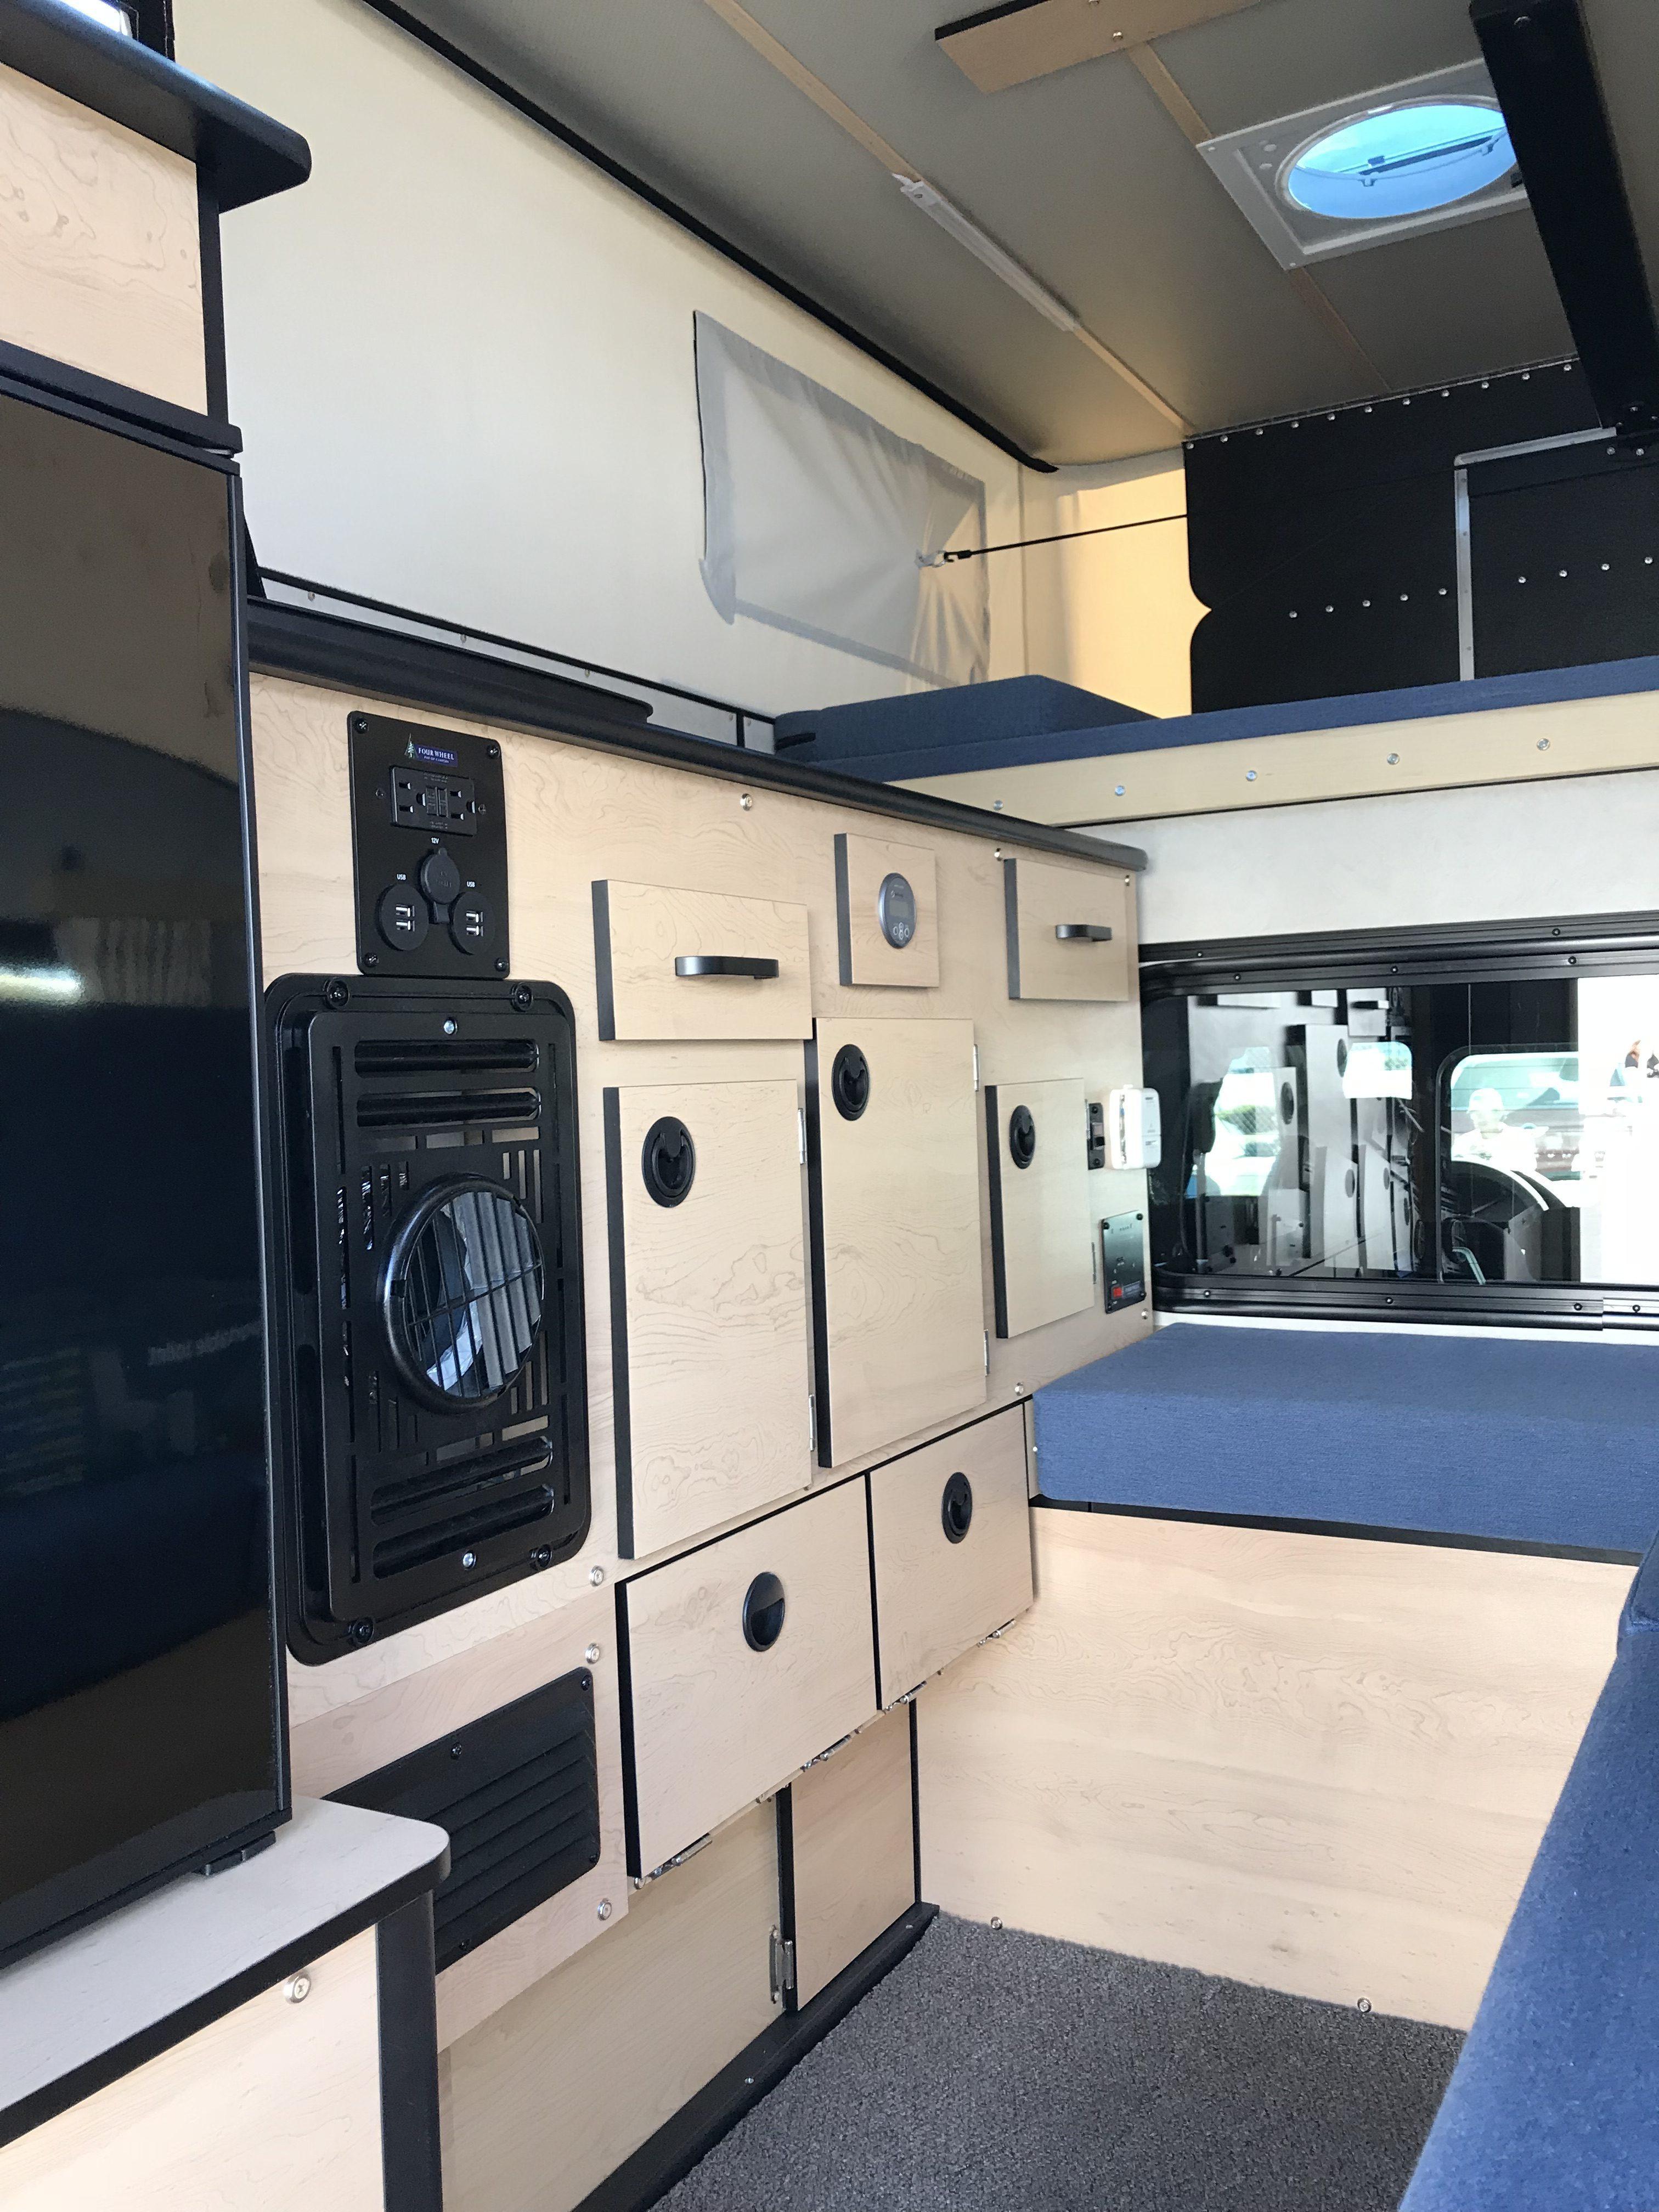 Four Wheel Campers - Inside storage